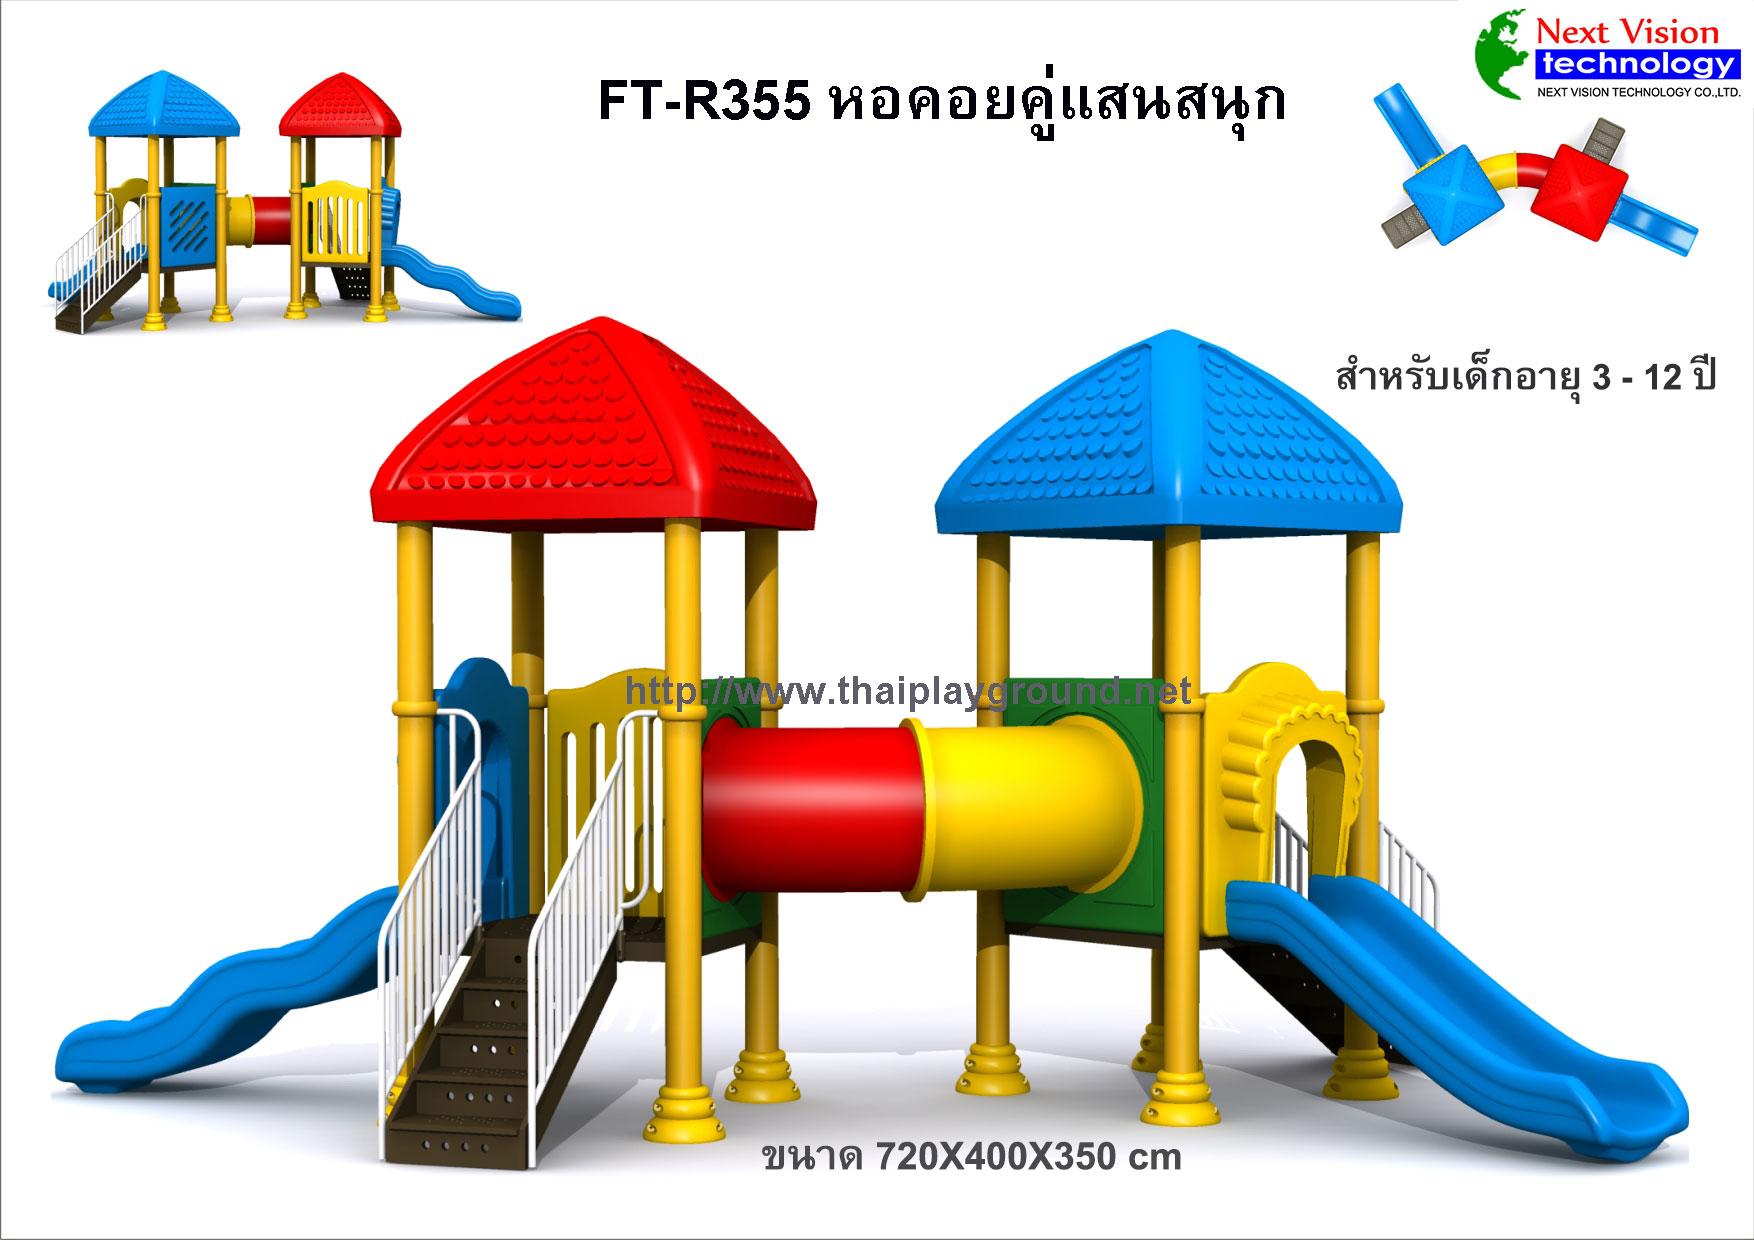 FT-R355 หอคอยคู่แสนสนุก